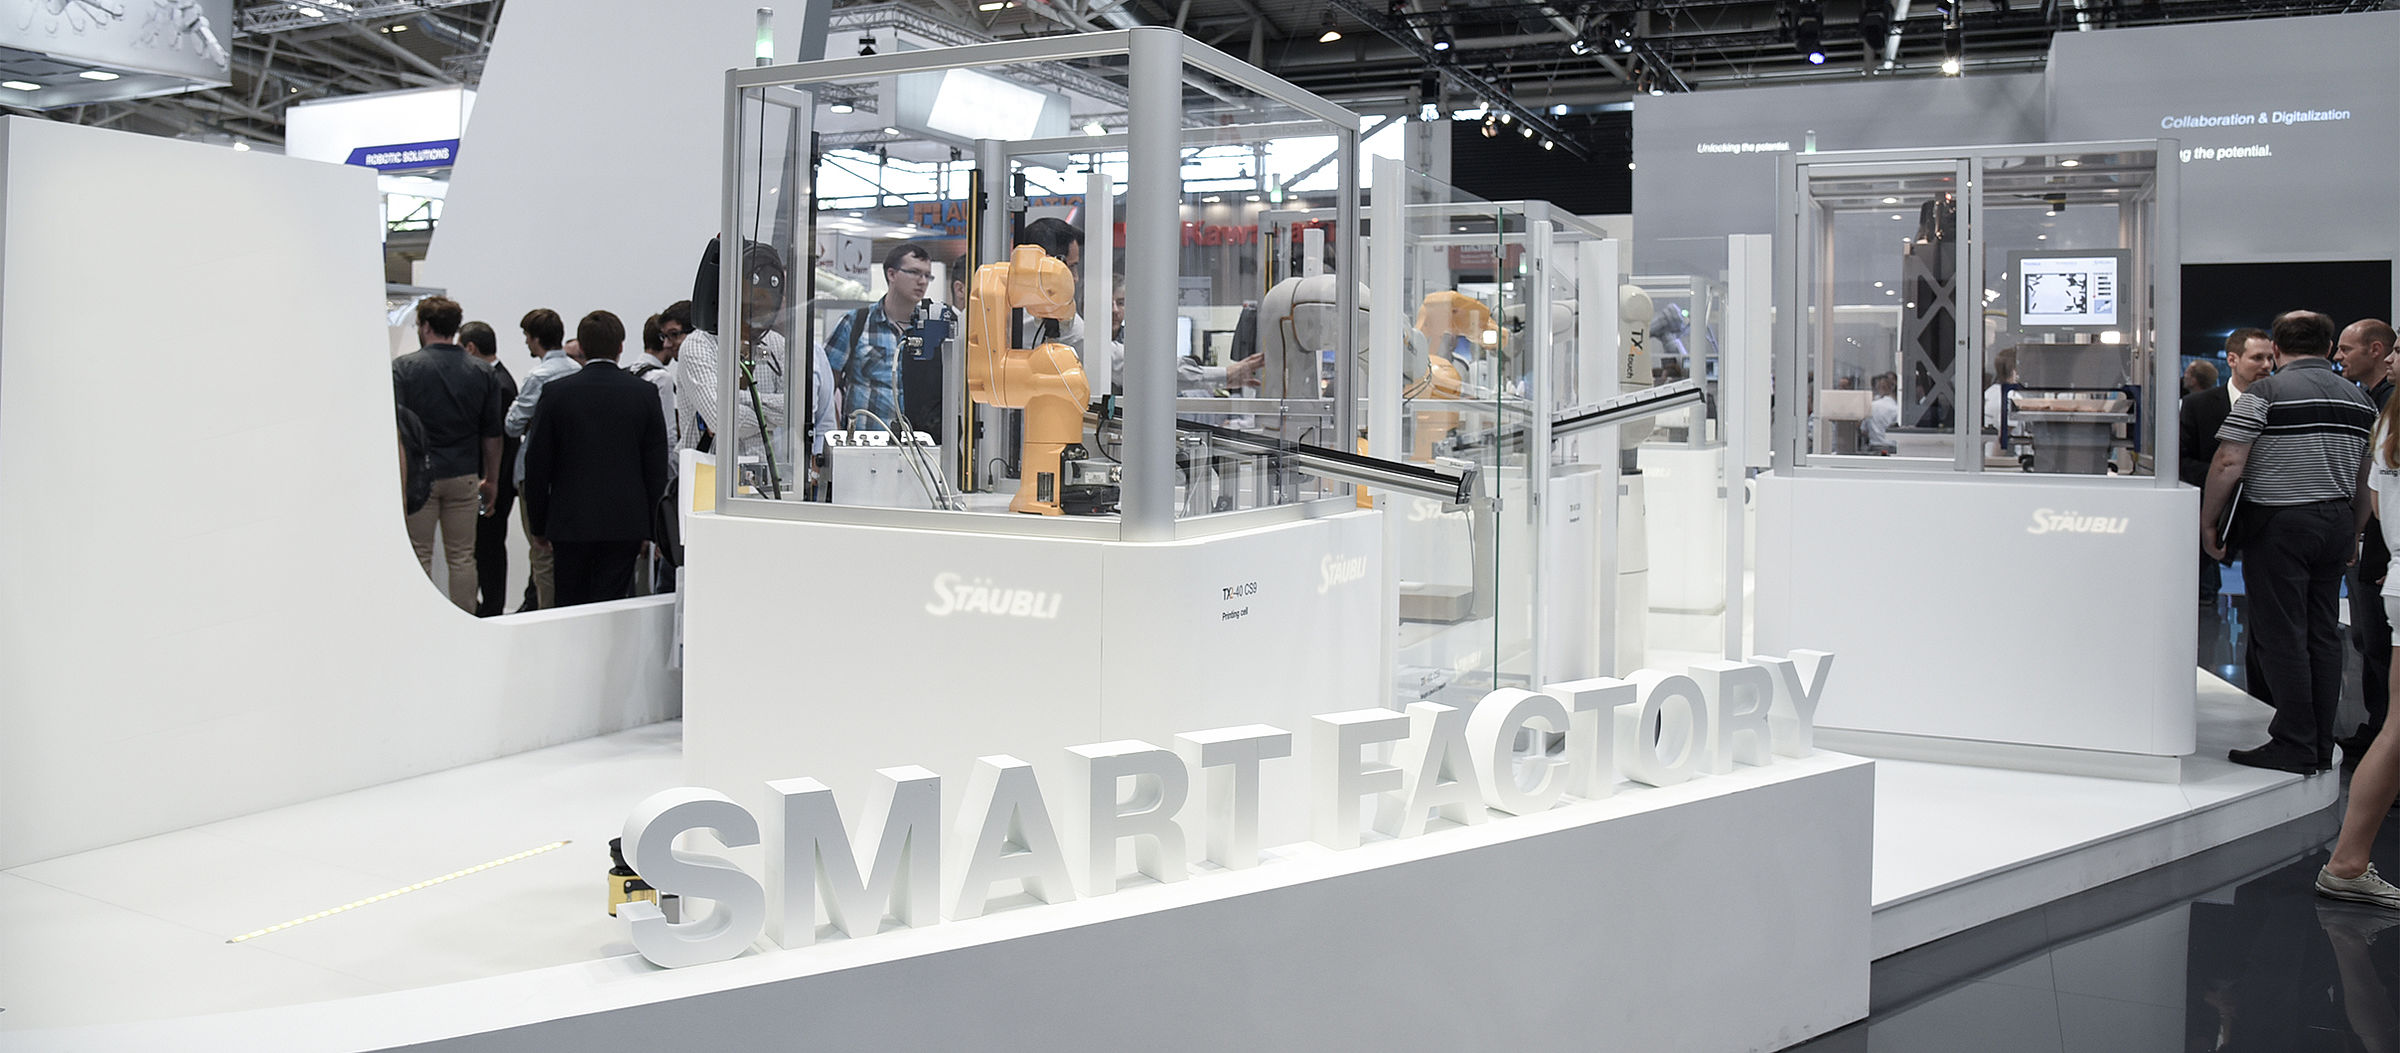 Stäubli AG - Staubli-robotics-Automatica-smart-factory-hip.jpg